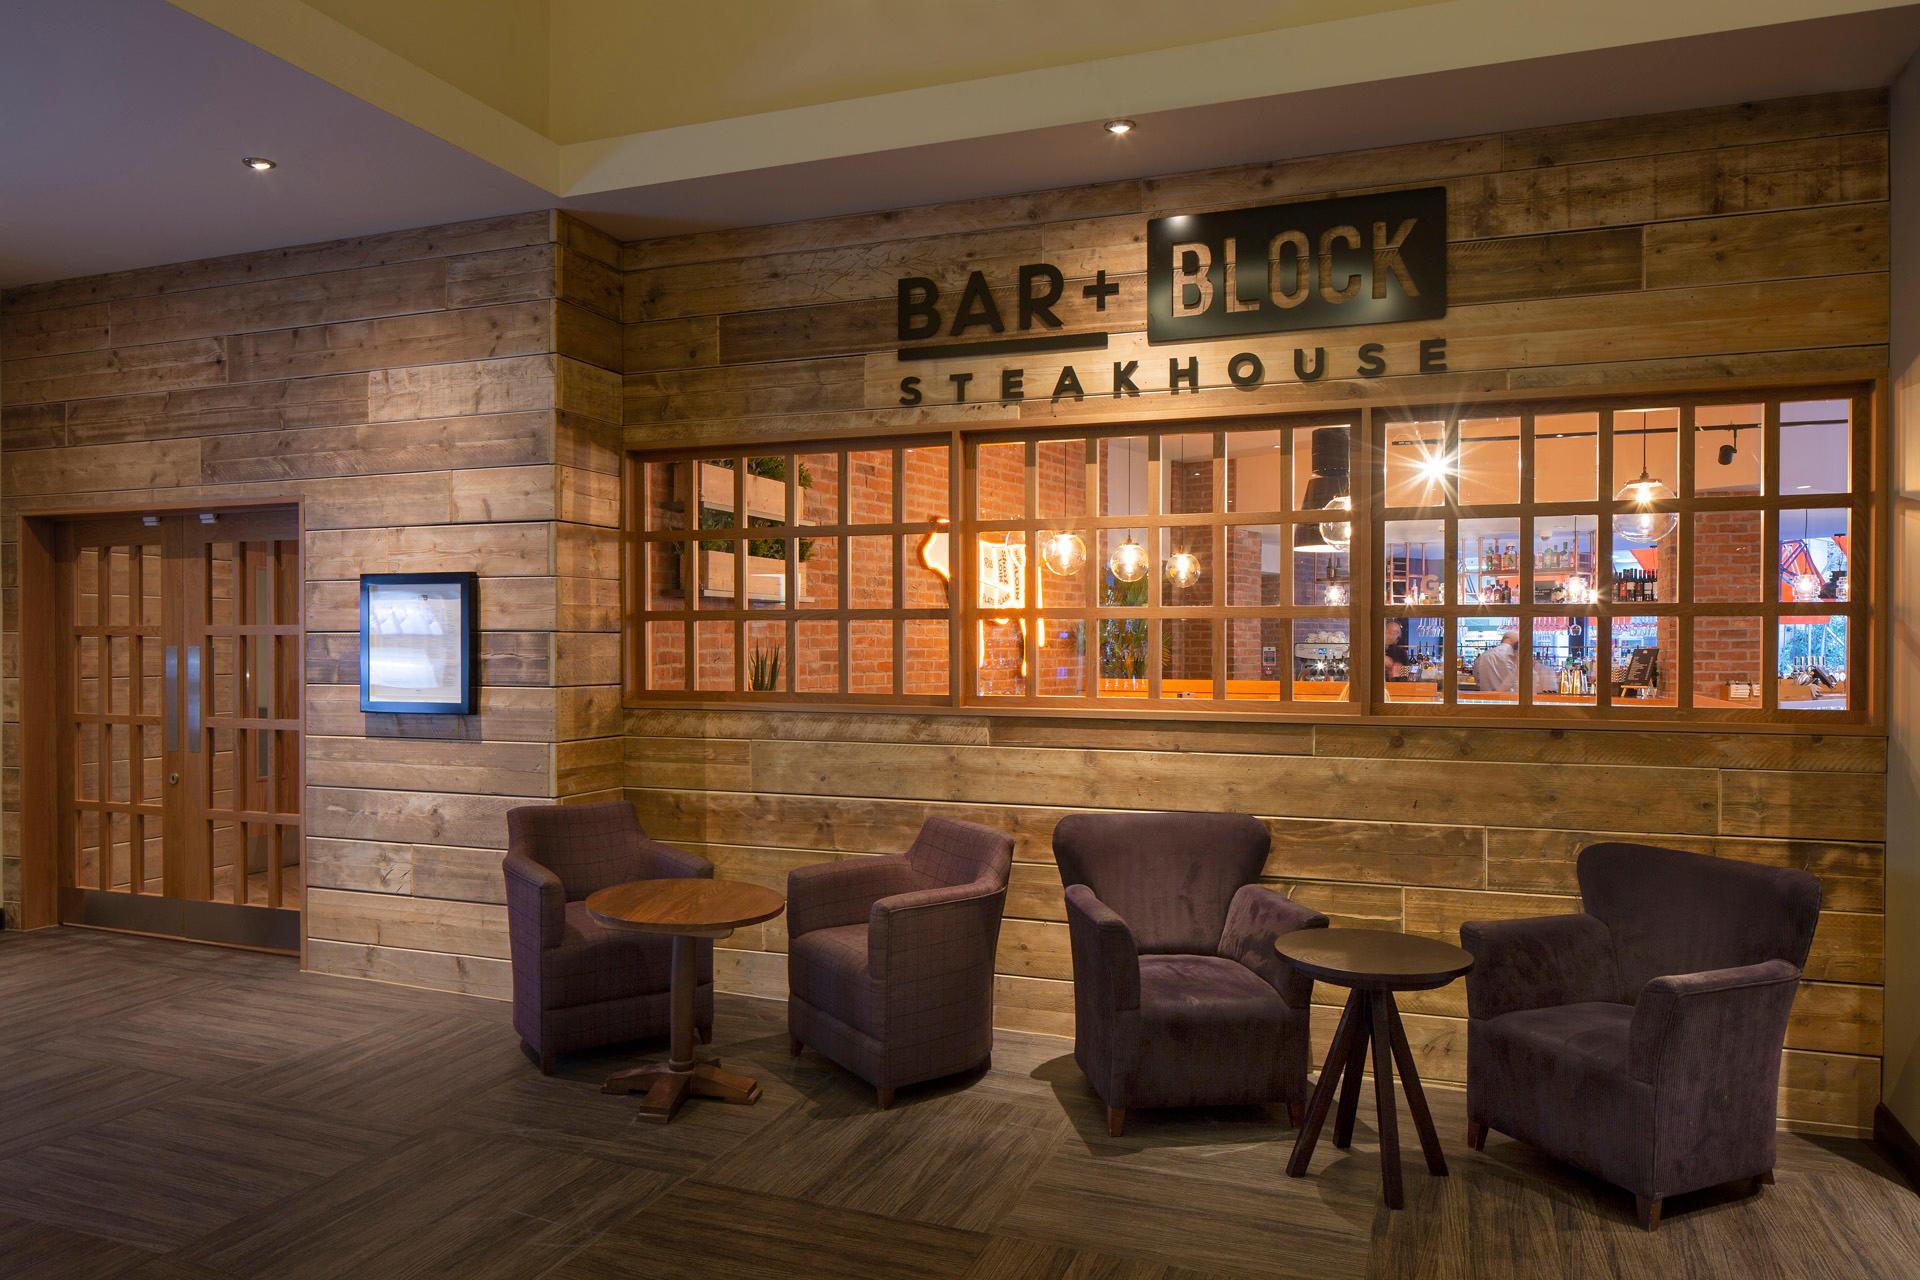 Bar + Block Steakhouse exterior Bar + Block Steakhouse Newcastle Newcastle 01918 141888